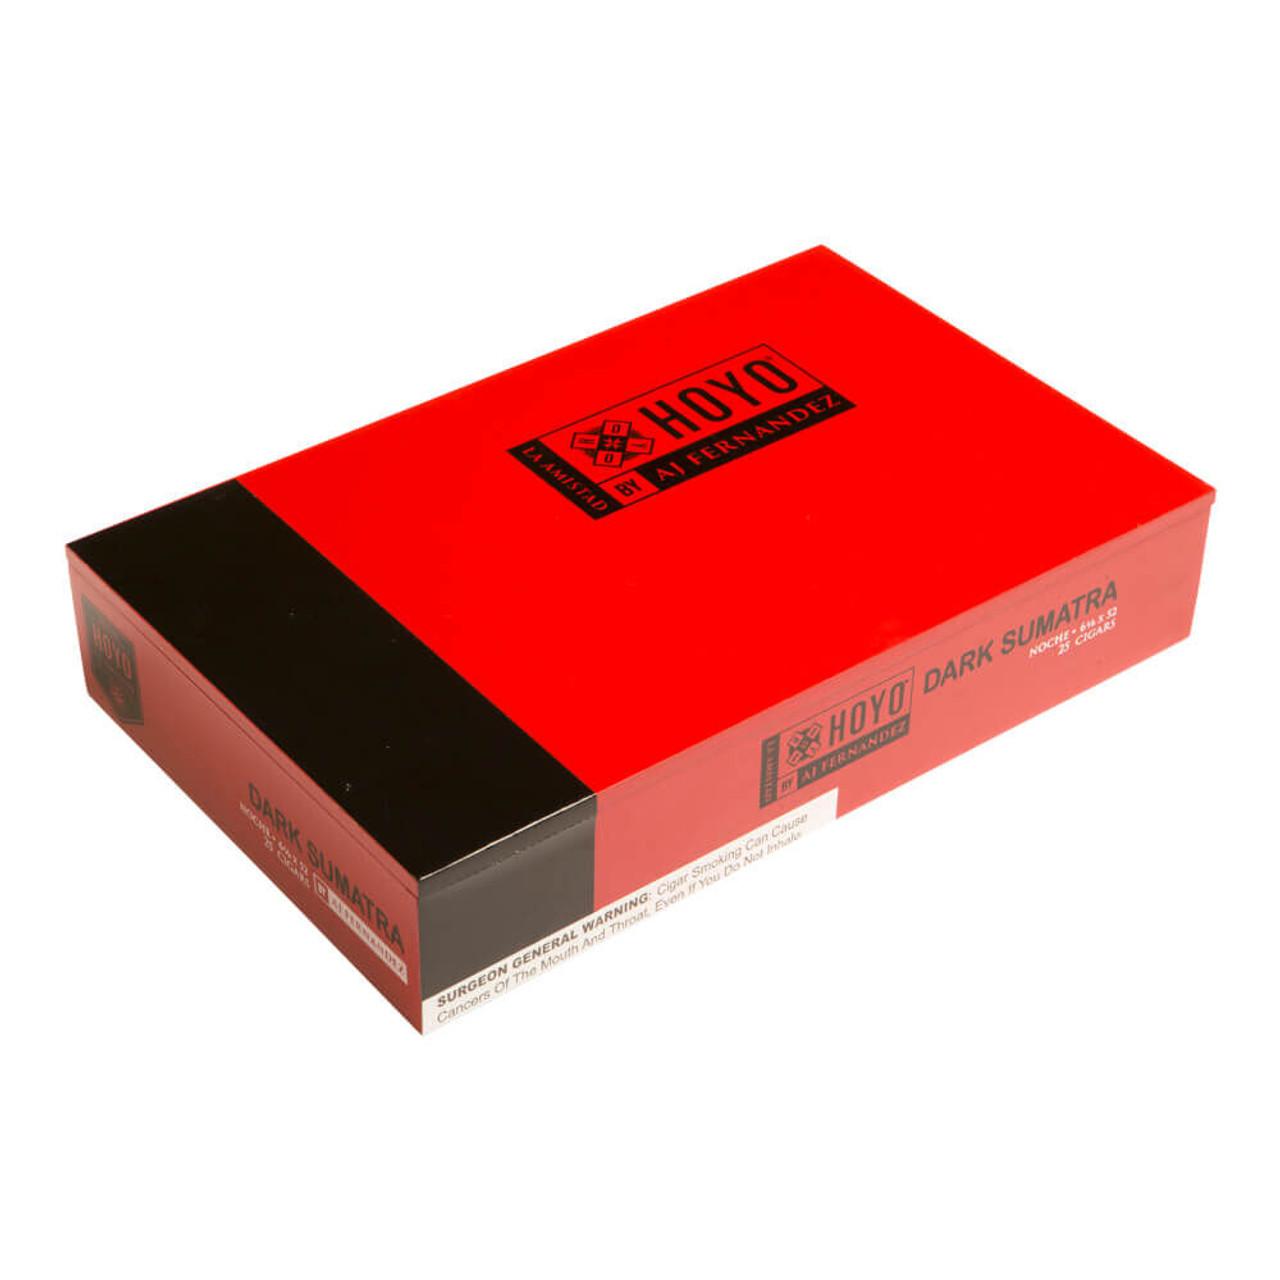 Hoyo La Amistad Dark Sumatra Noche Cigars - 6.5 x 52 (Box of 25)